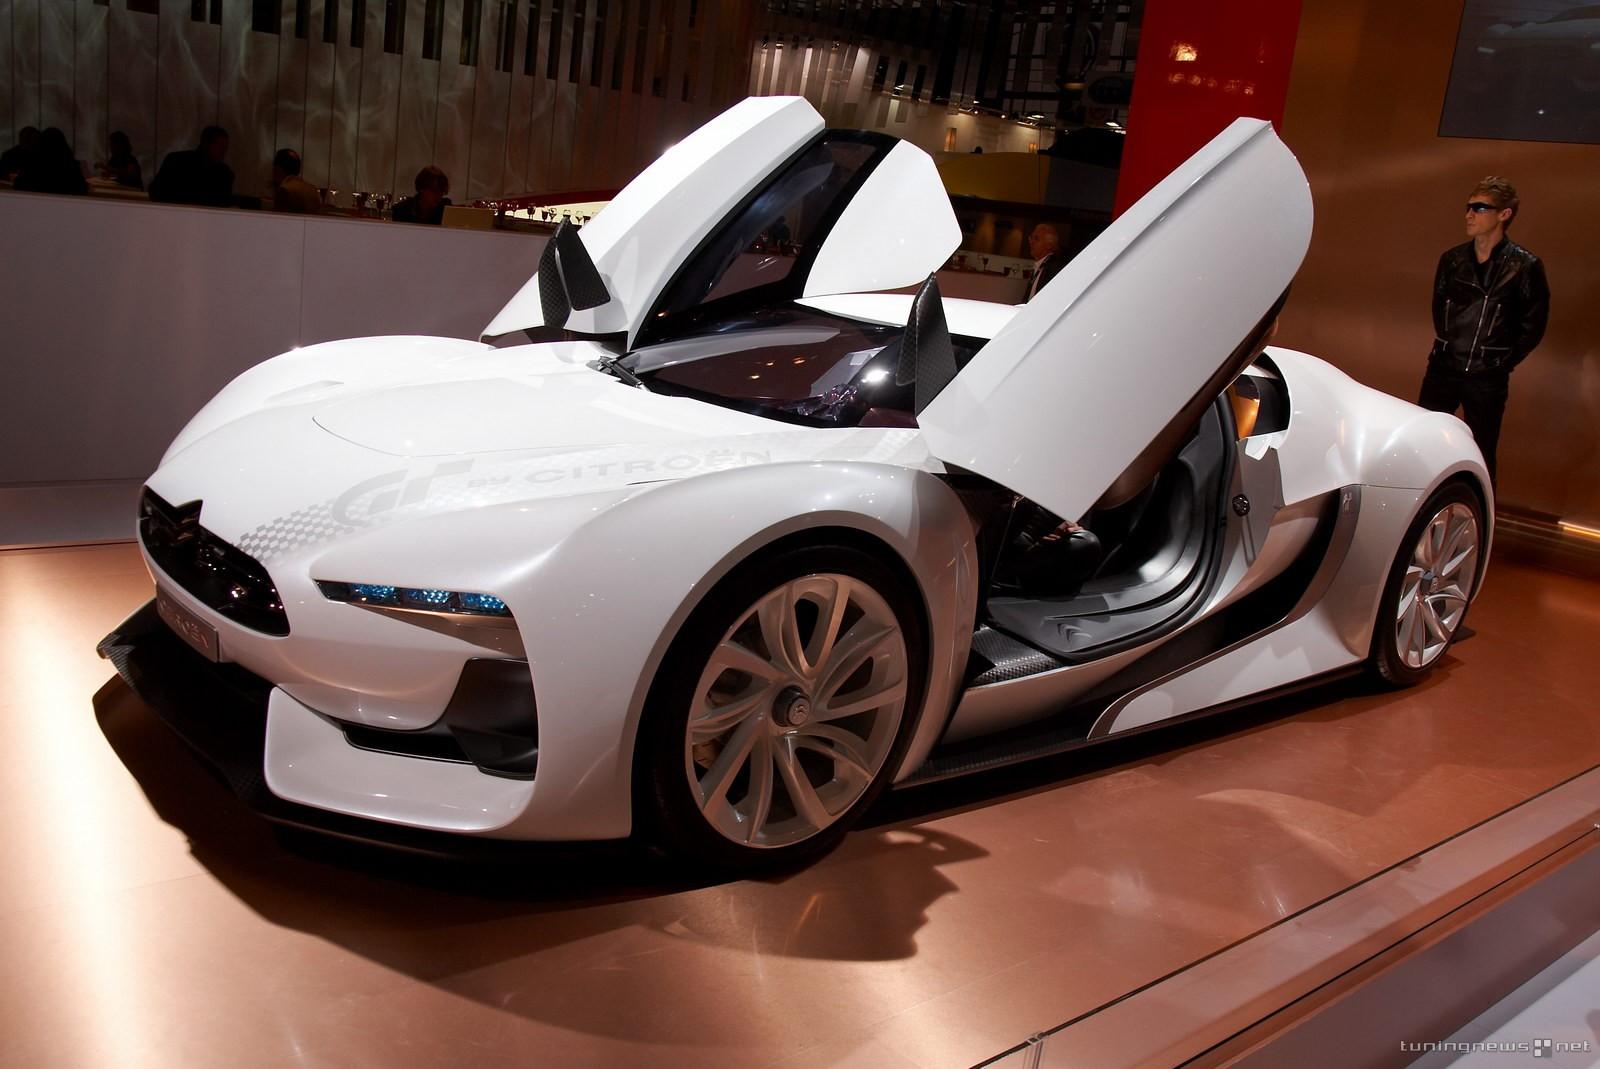 Citroen GTby Citroen | Concept Cars - Citroen UK